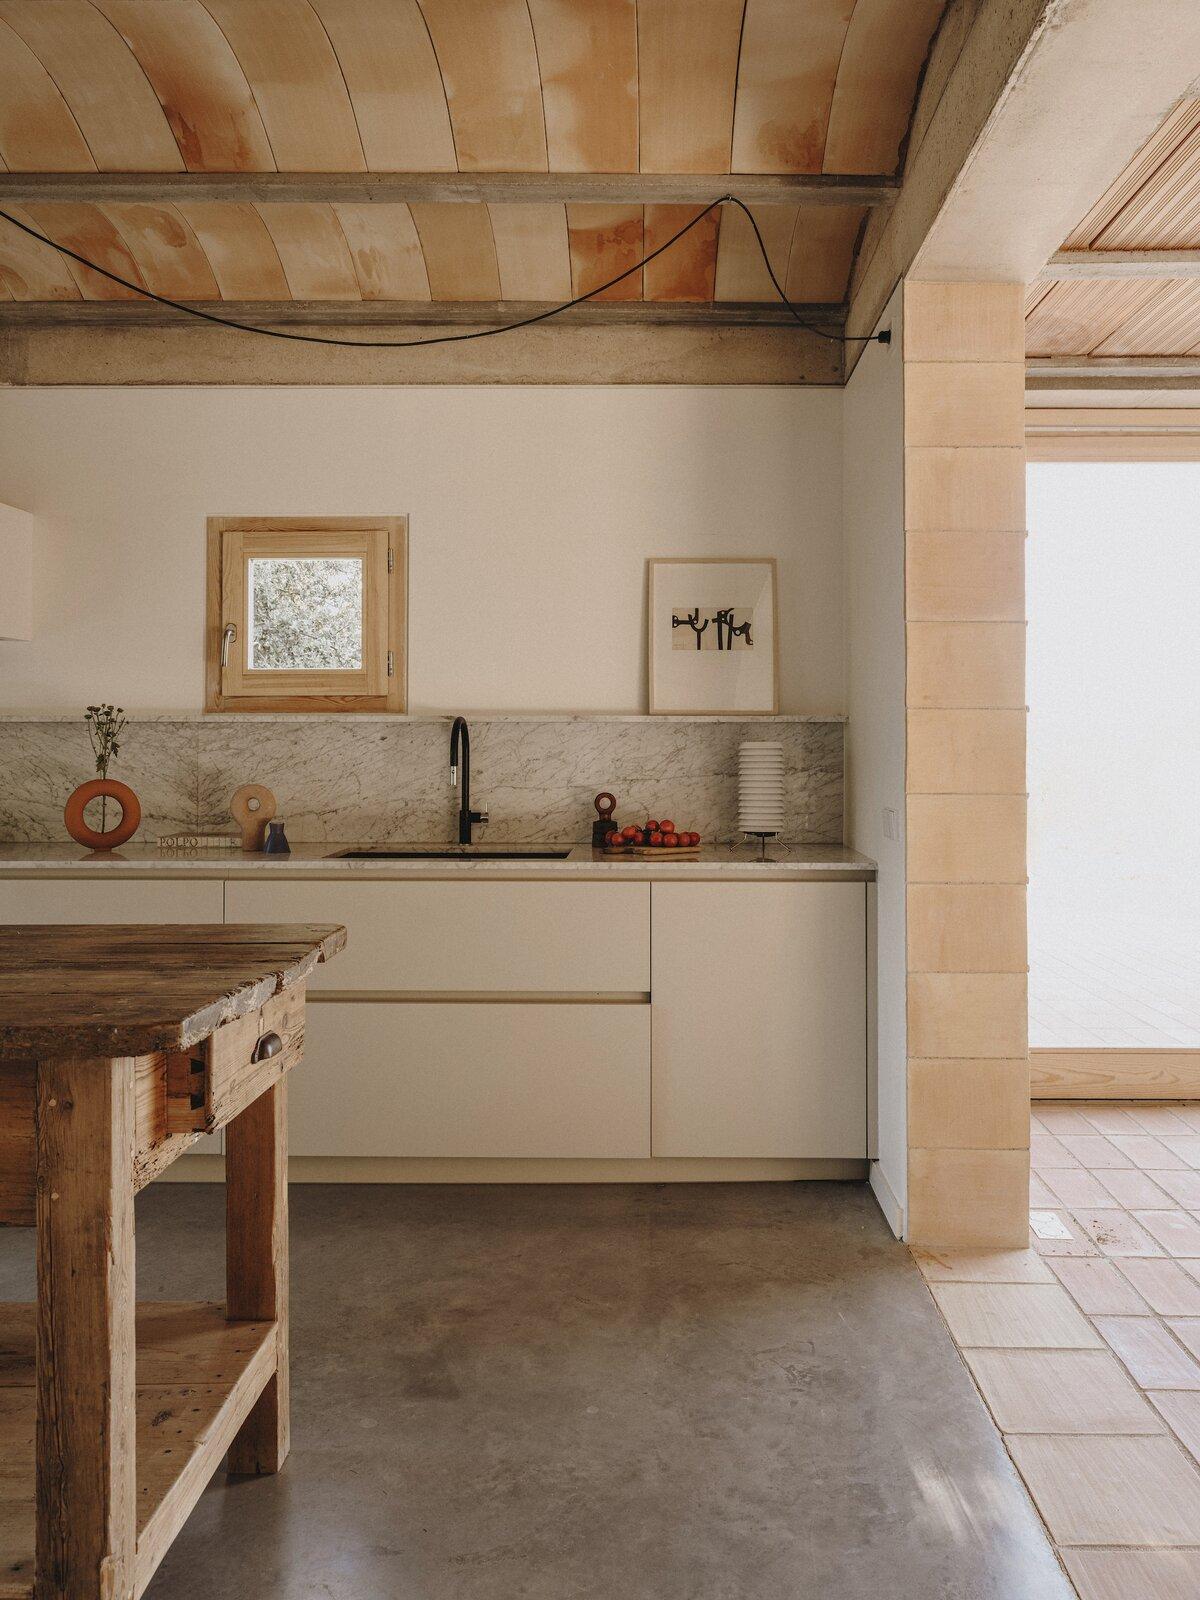 Kitchen of Casa Ter by Mesura.